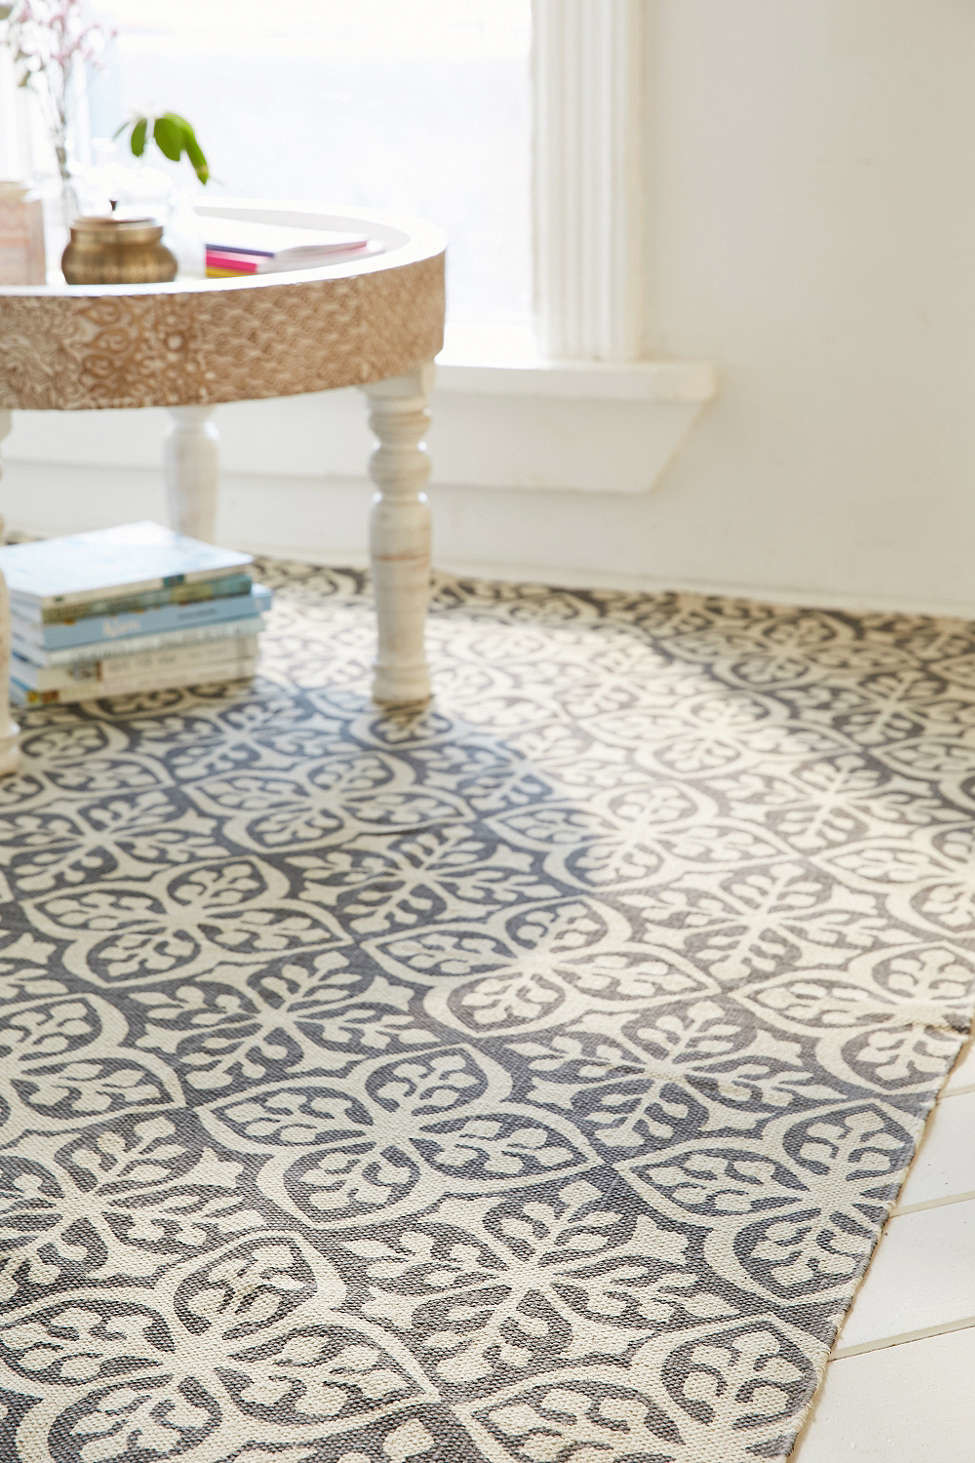 Moroccan pattern tile floor